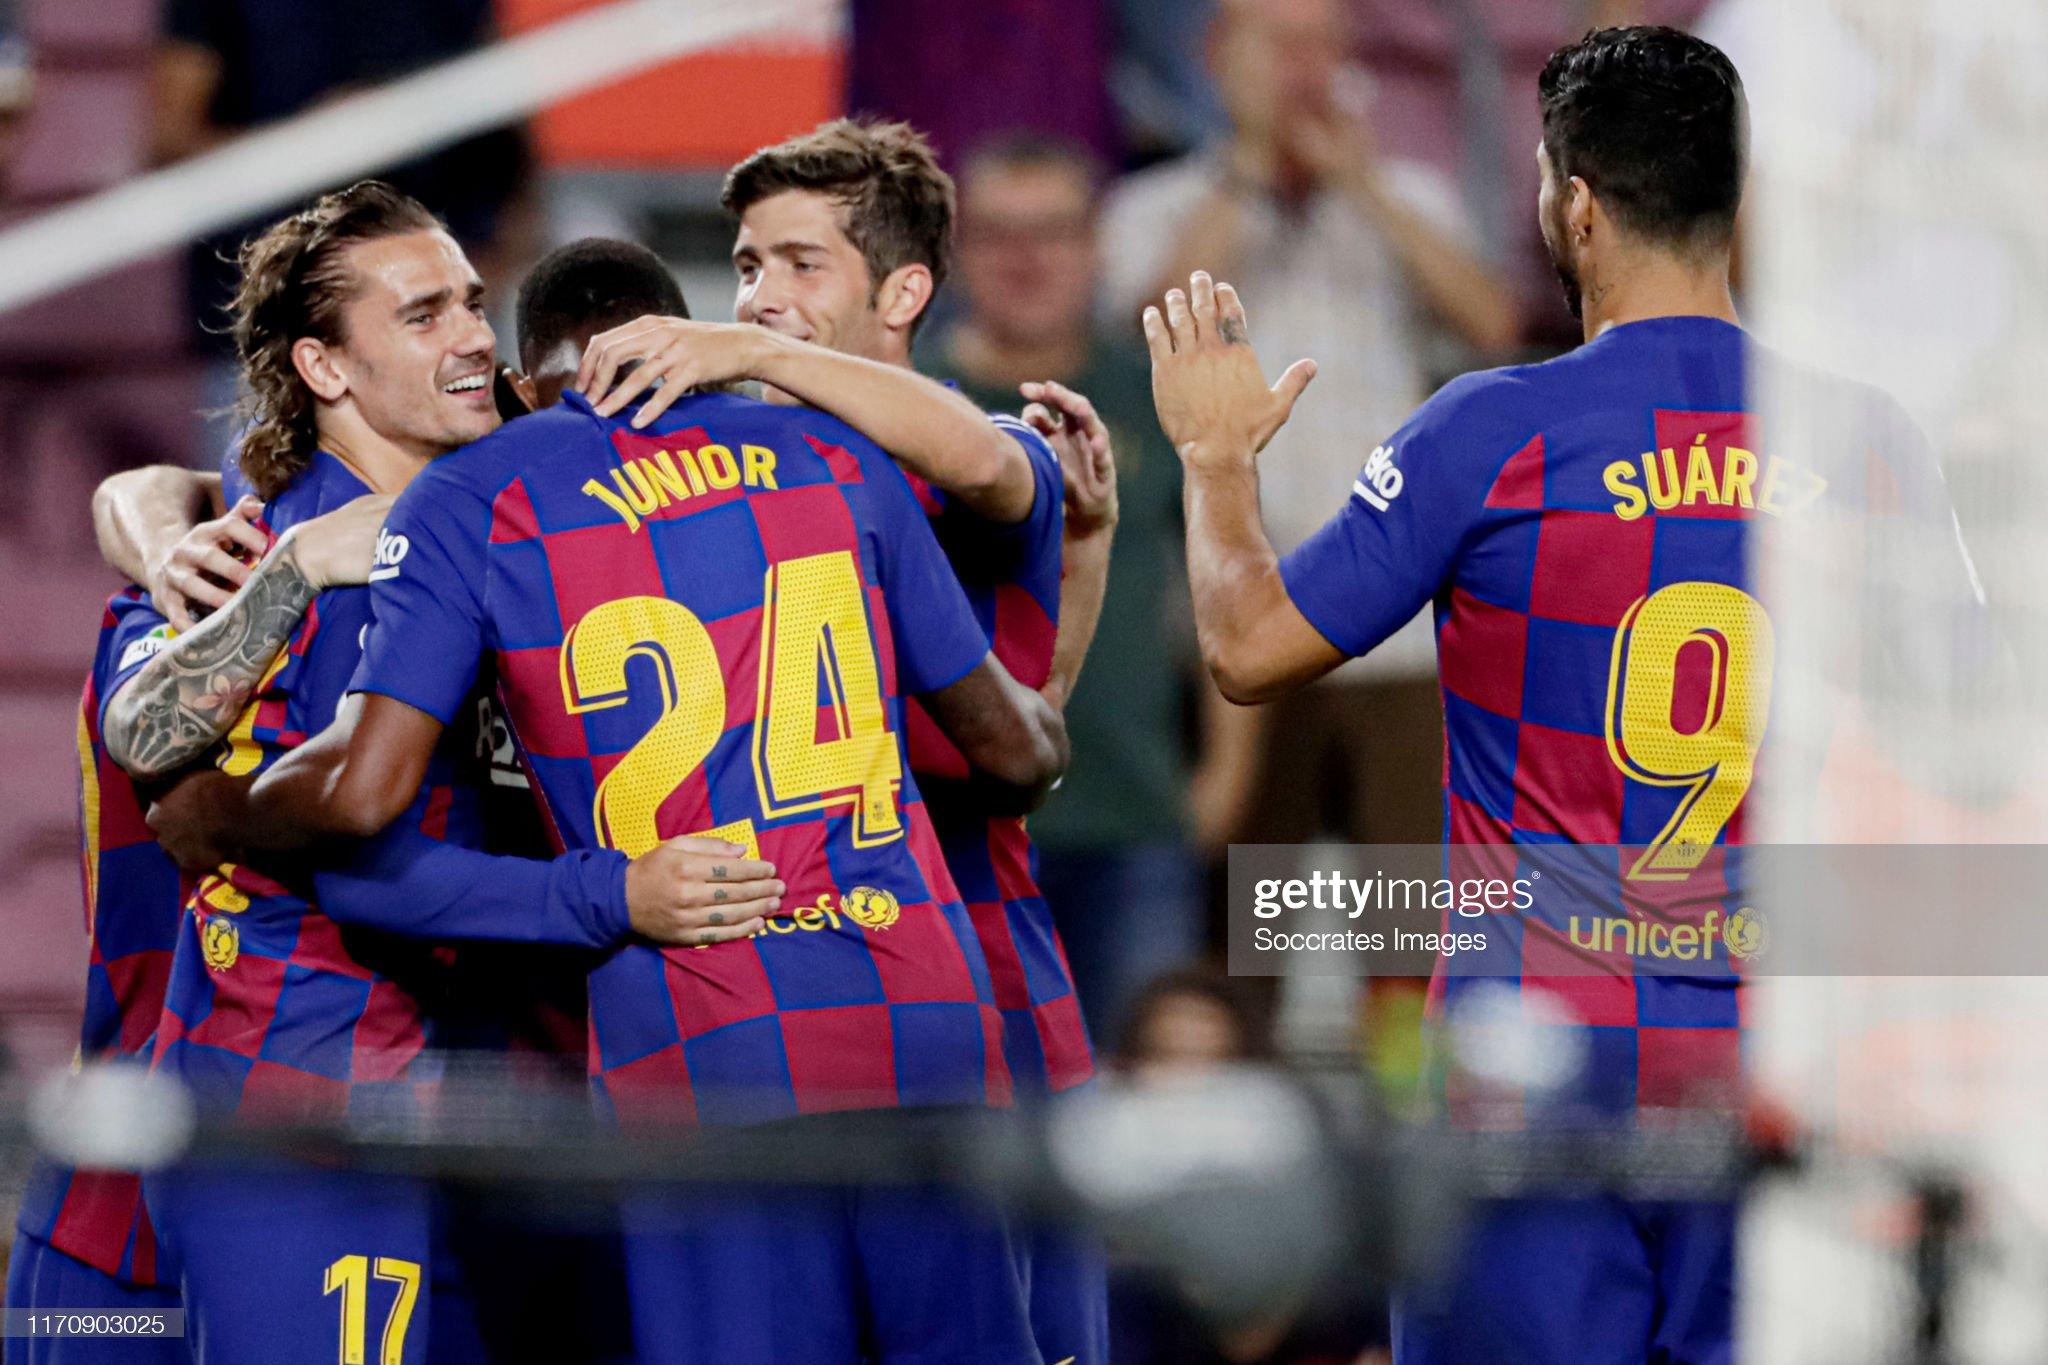 صور مباراة : برشلونة - فياريال 2-1 ( 24-09-2019 )  Antoine-griezmann-of-fc-barcelona-celebrates-10-with-lionel-messi-of-picture-id1170903025?s=2048x2048